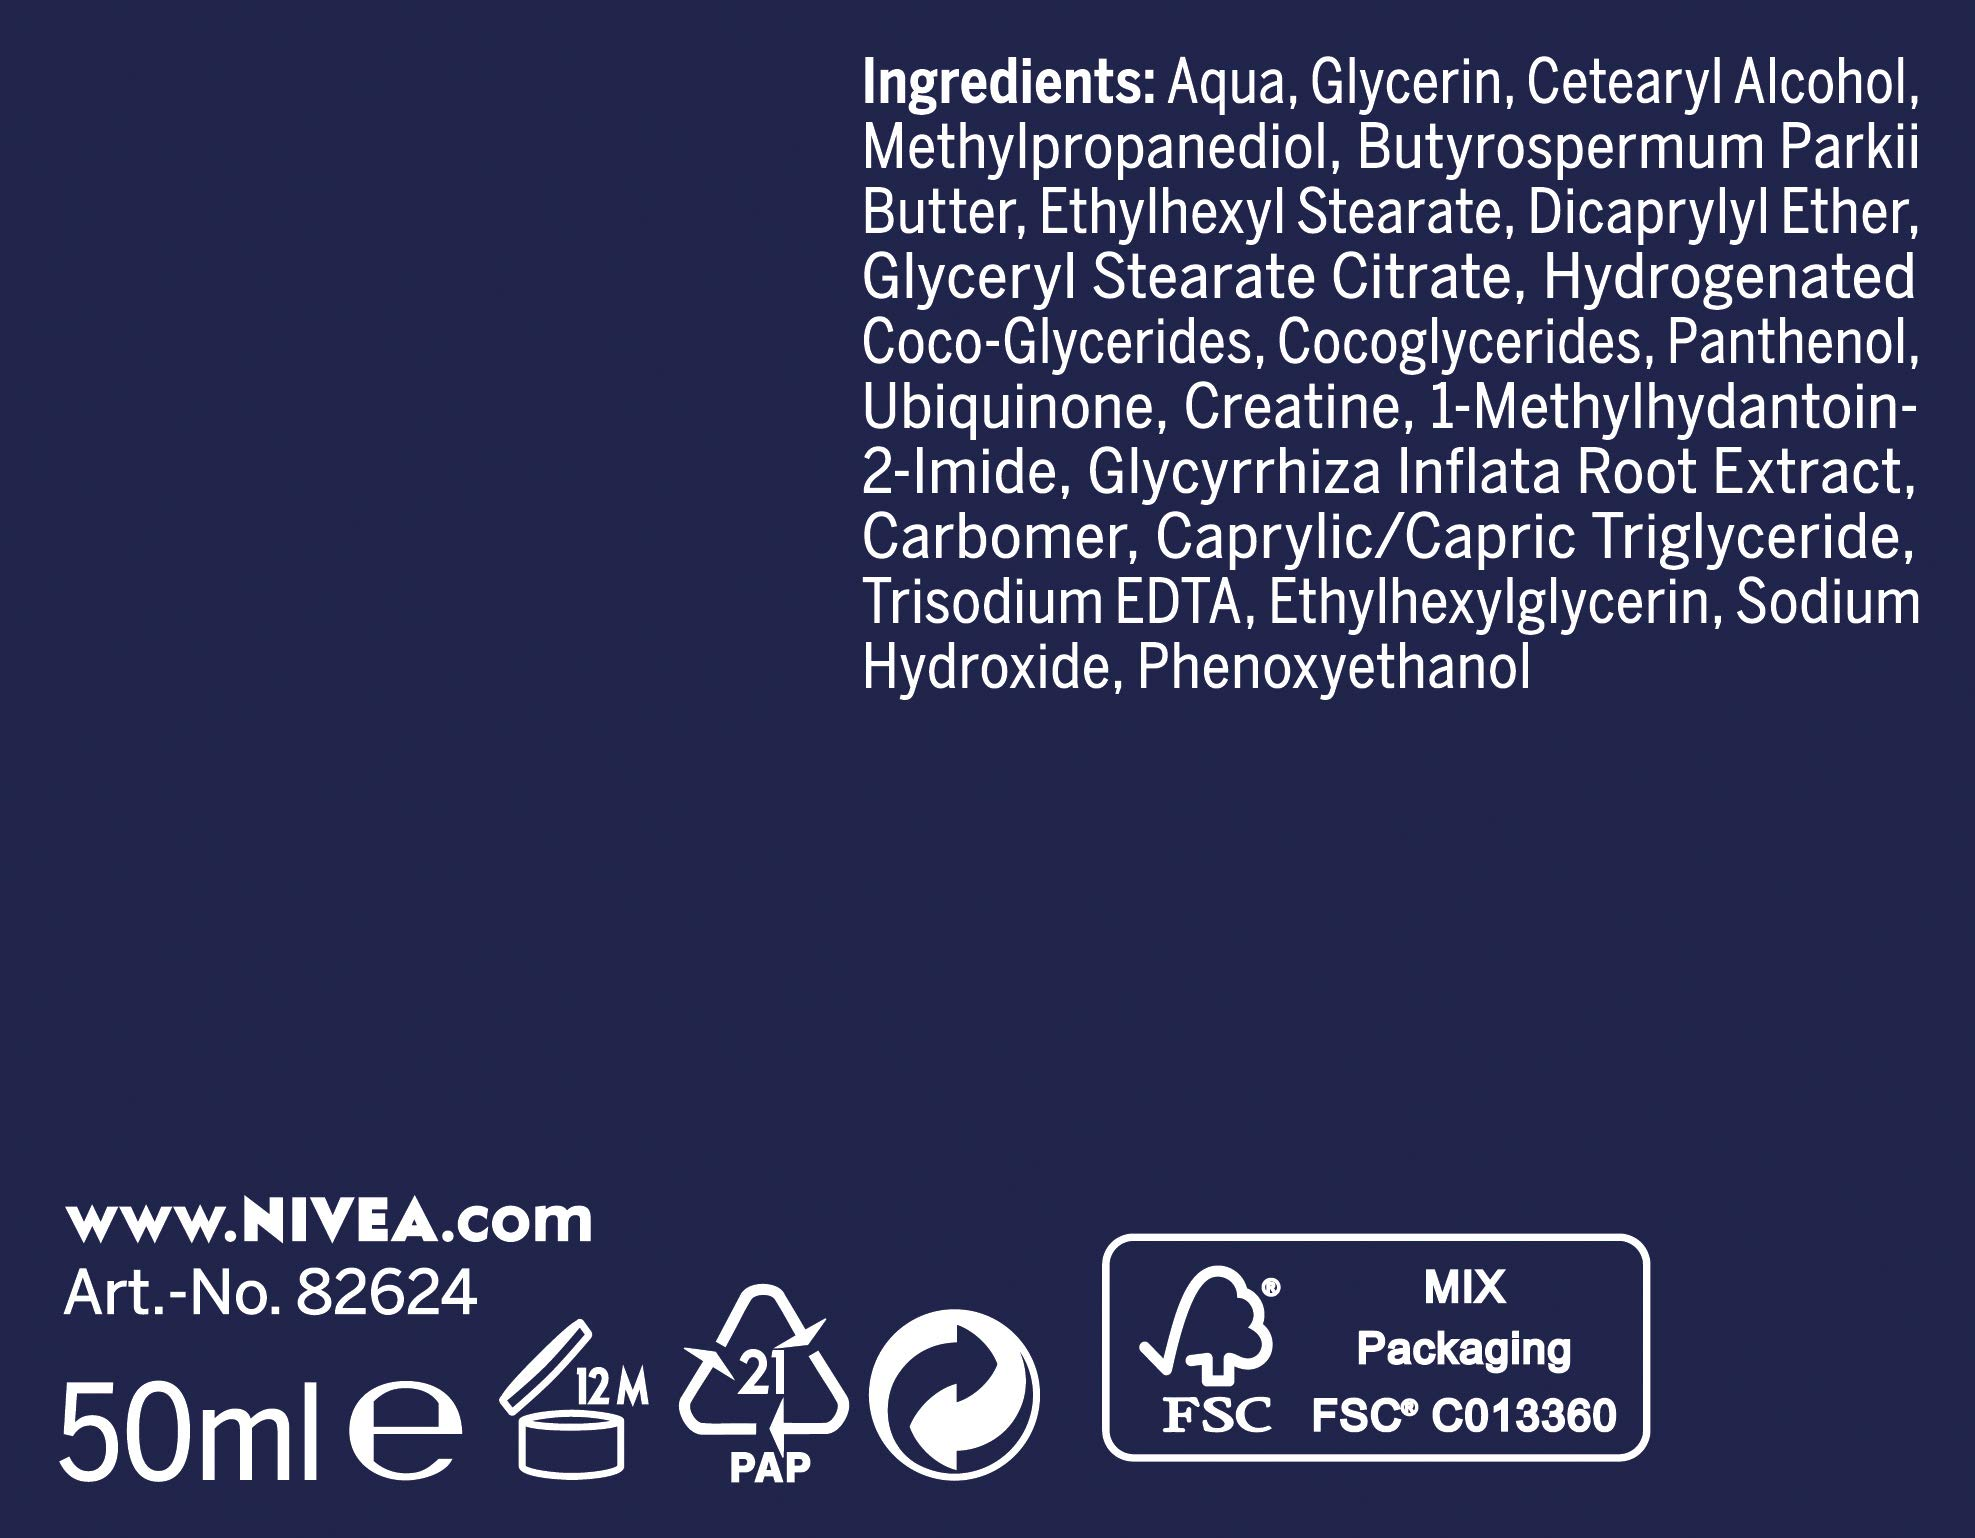 Nivea Q10Power anti-arrugas + Reducir sensibilidad de noche para rejuvenecedora Cuidado, feuchtigkeitsspendende Crema, 2unidades (2x 50ml)